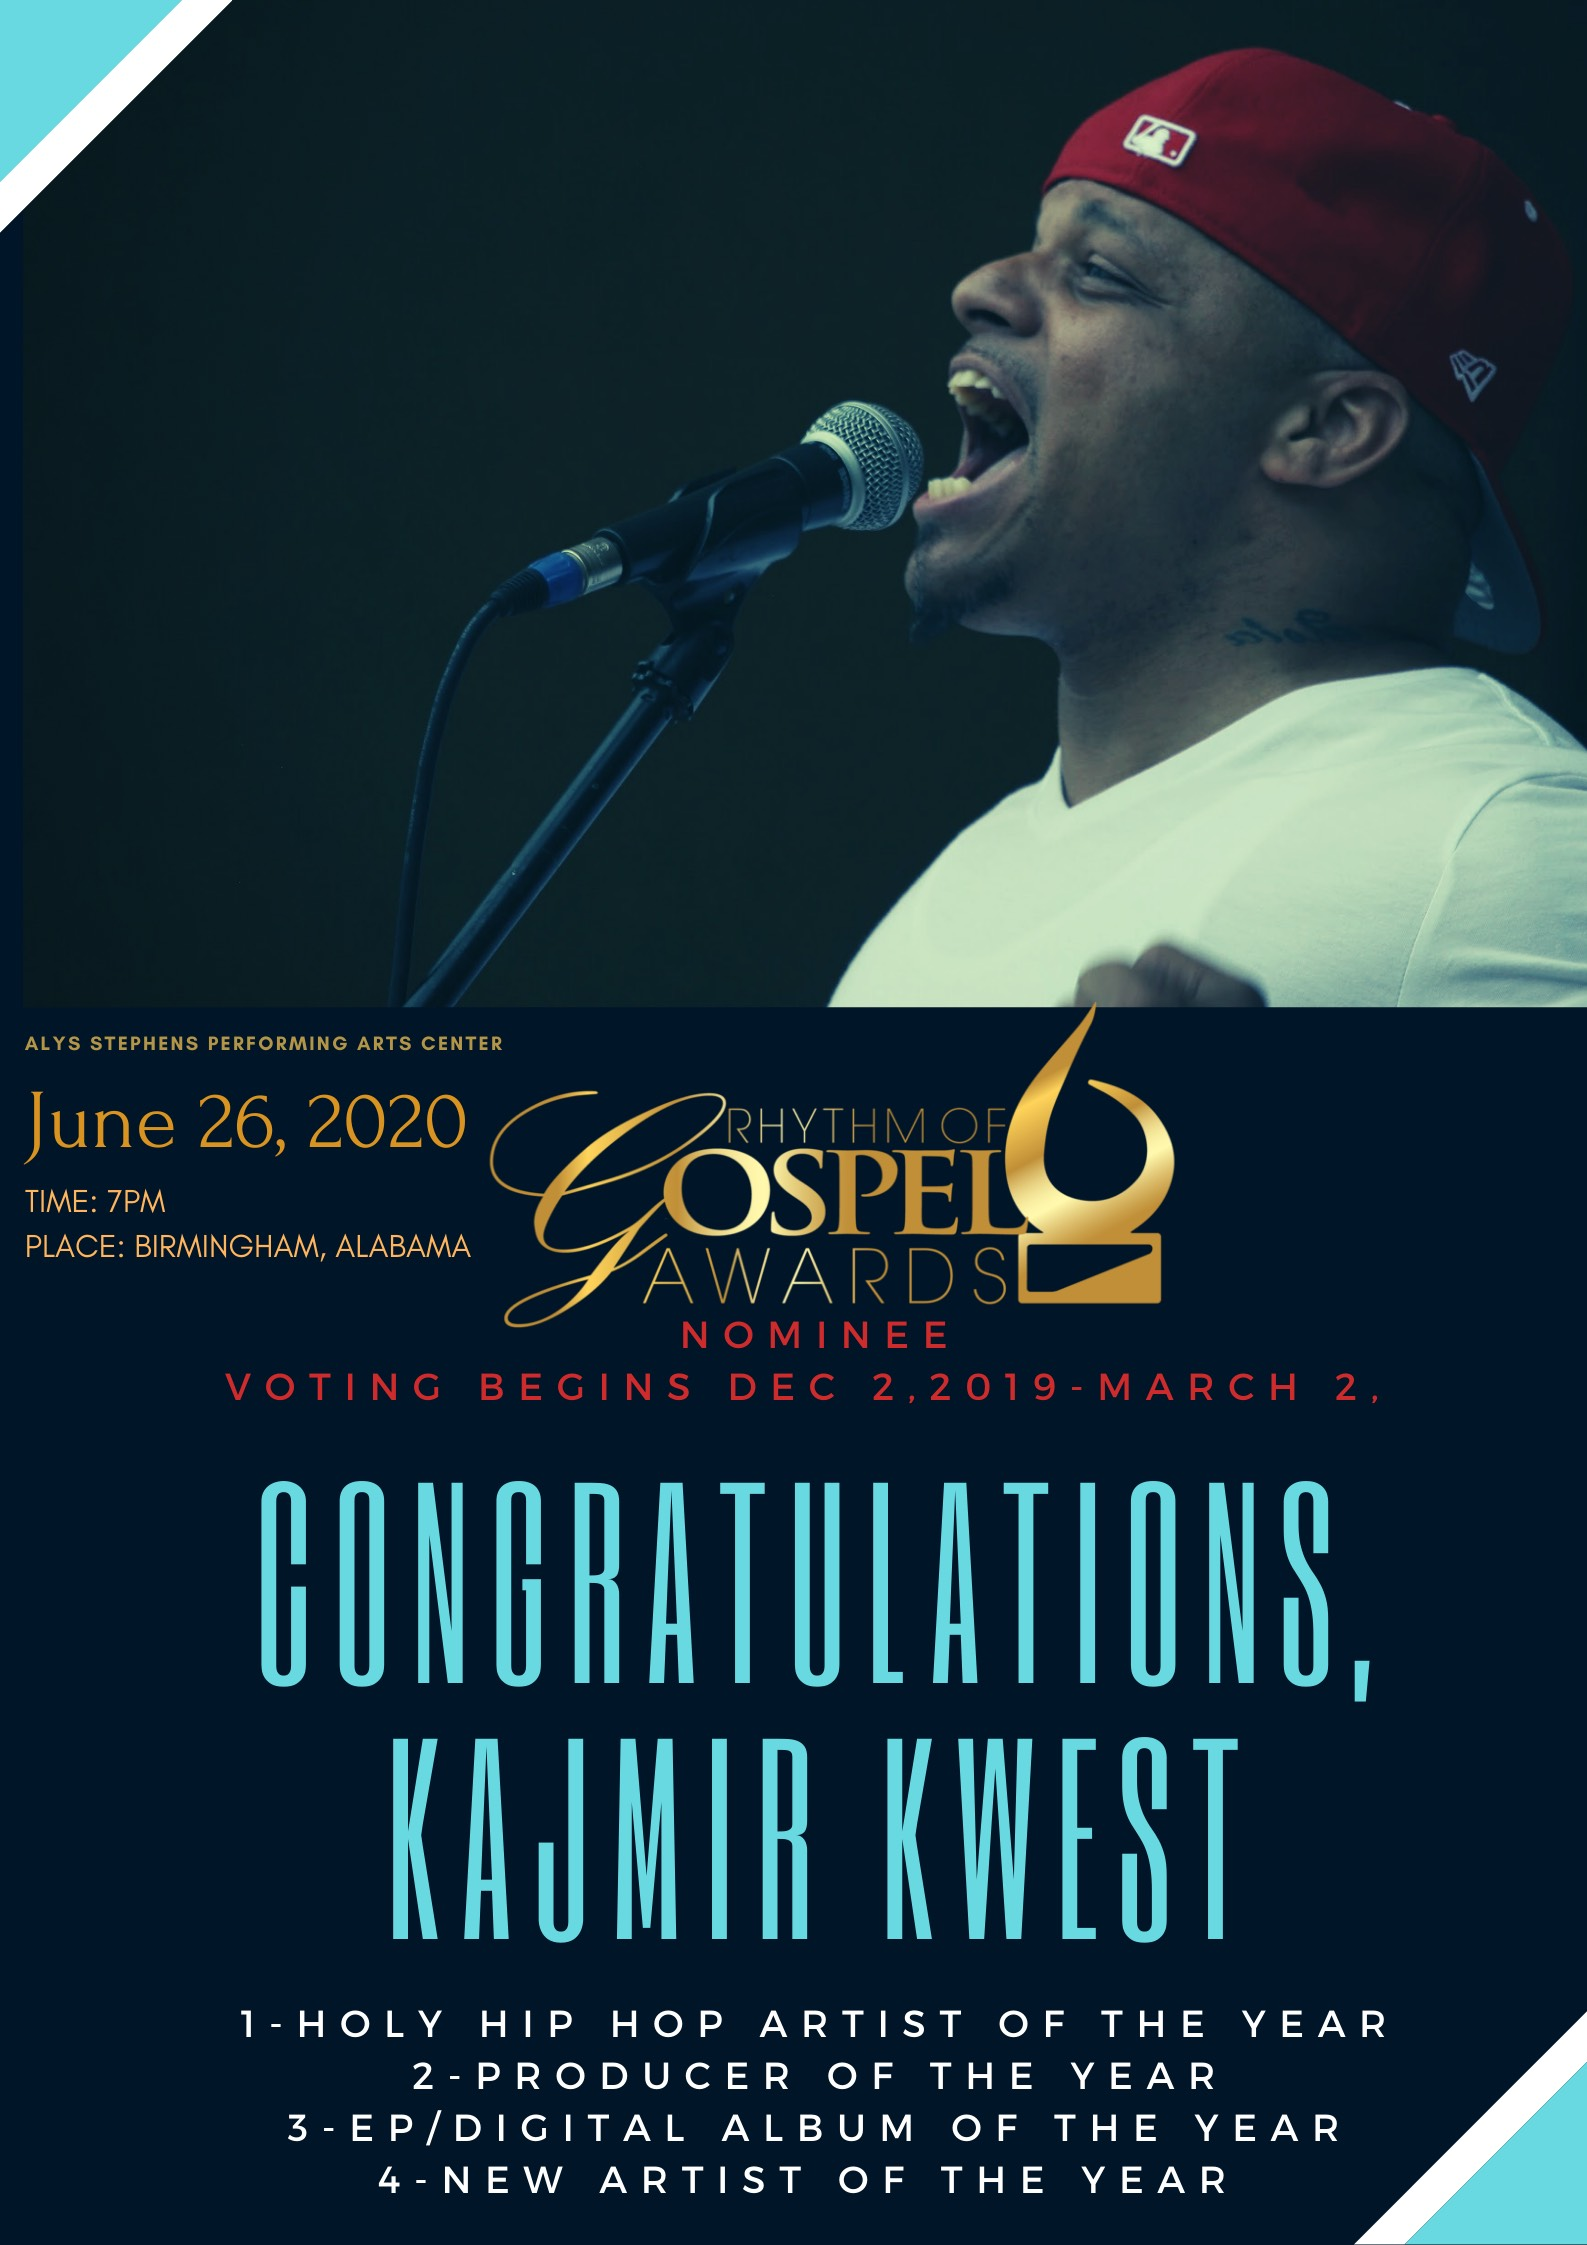 Congratulations Kajmir kwest